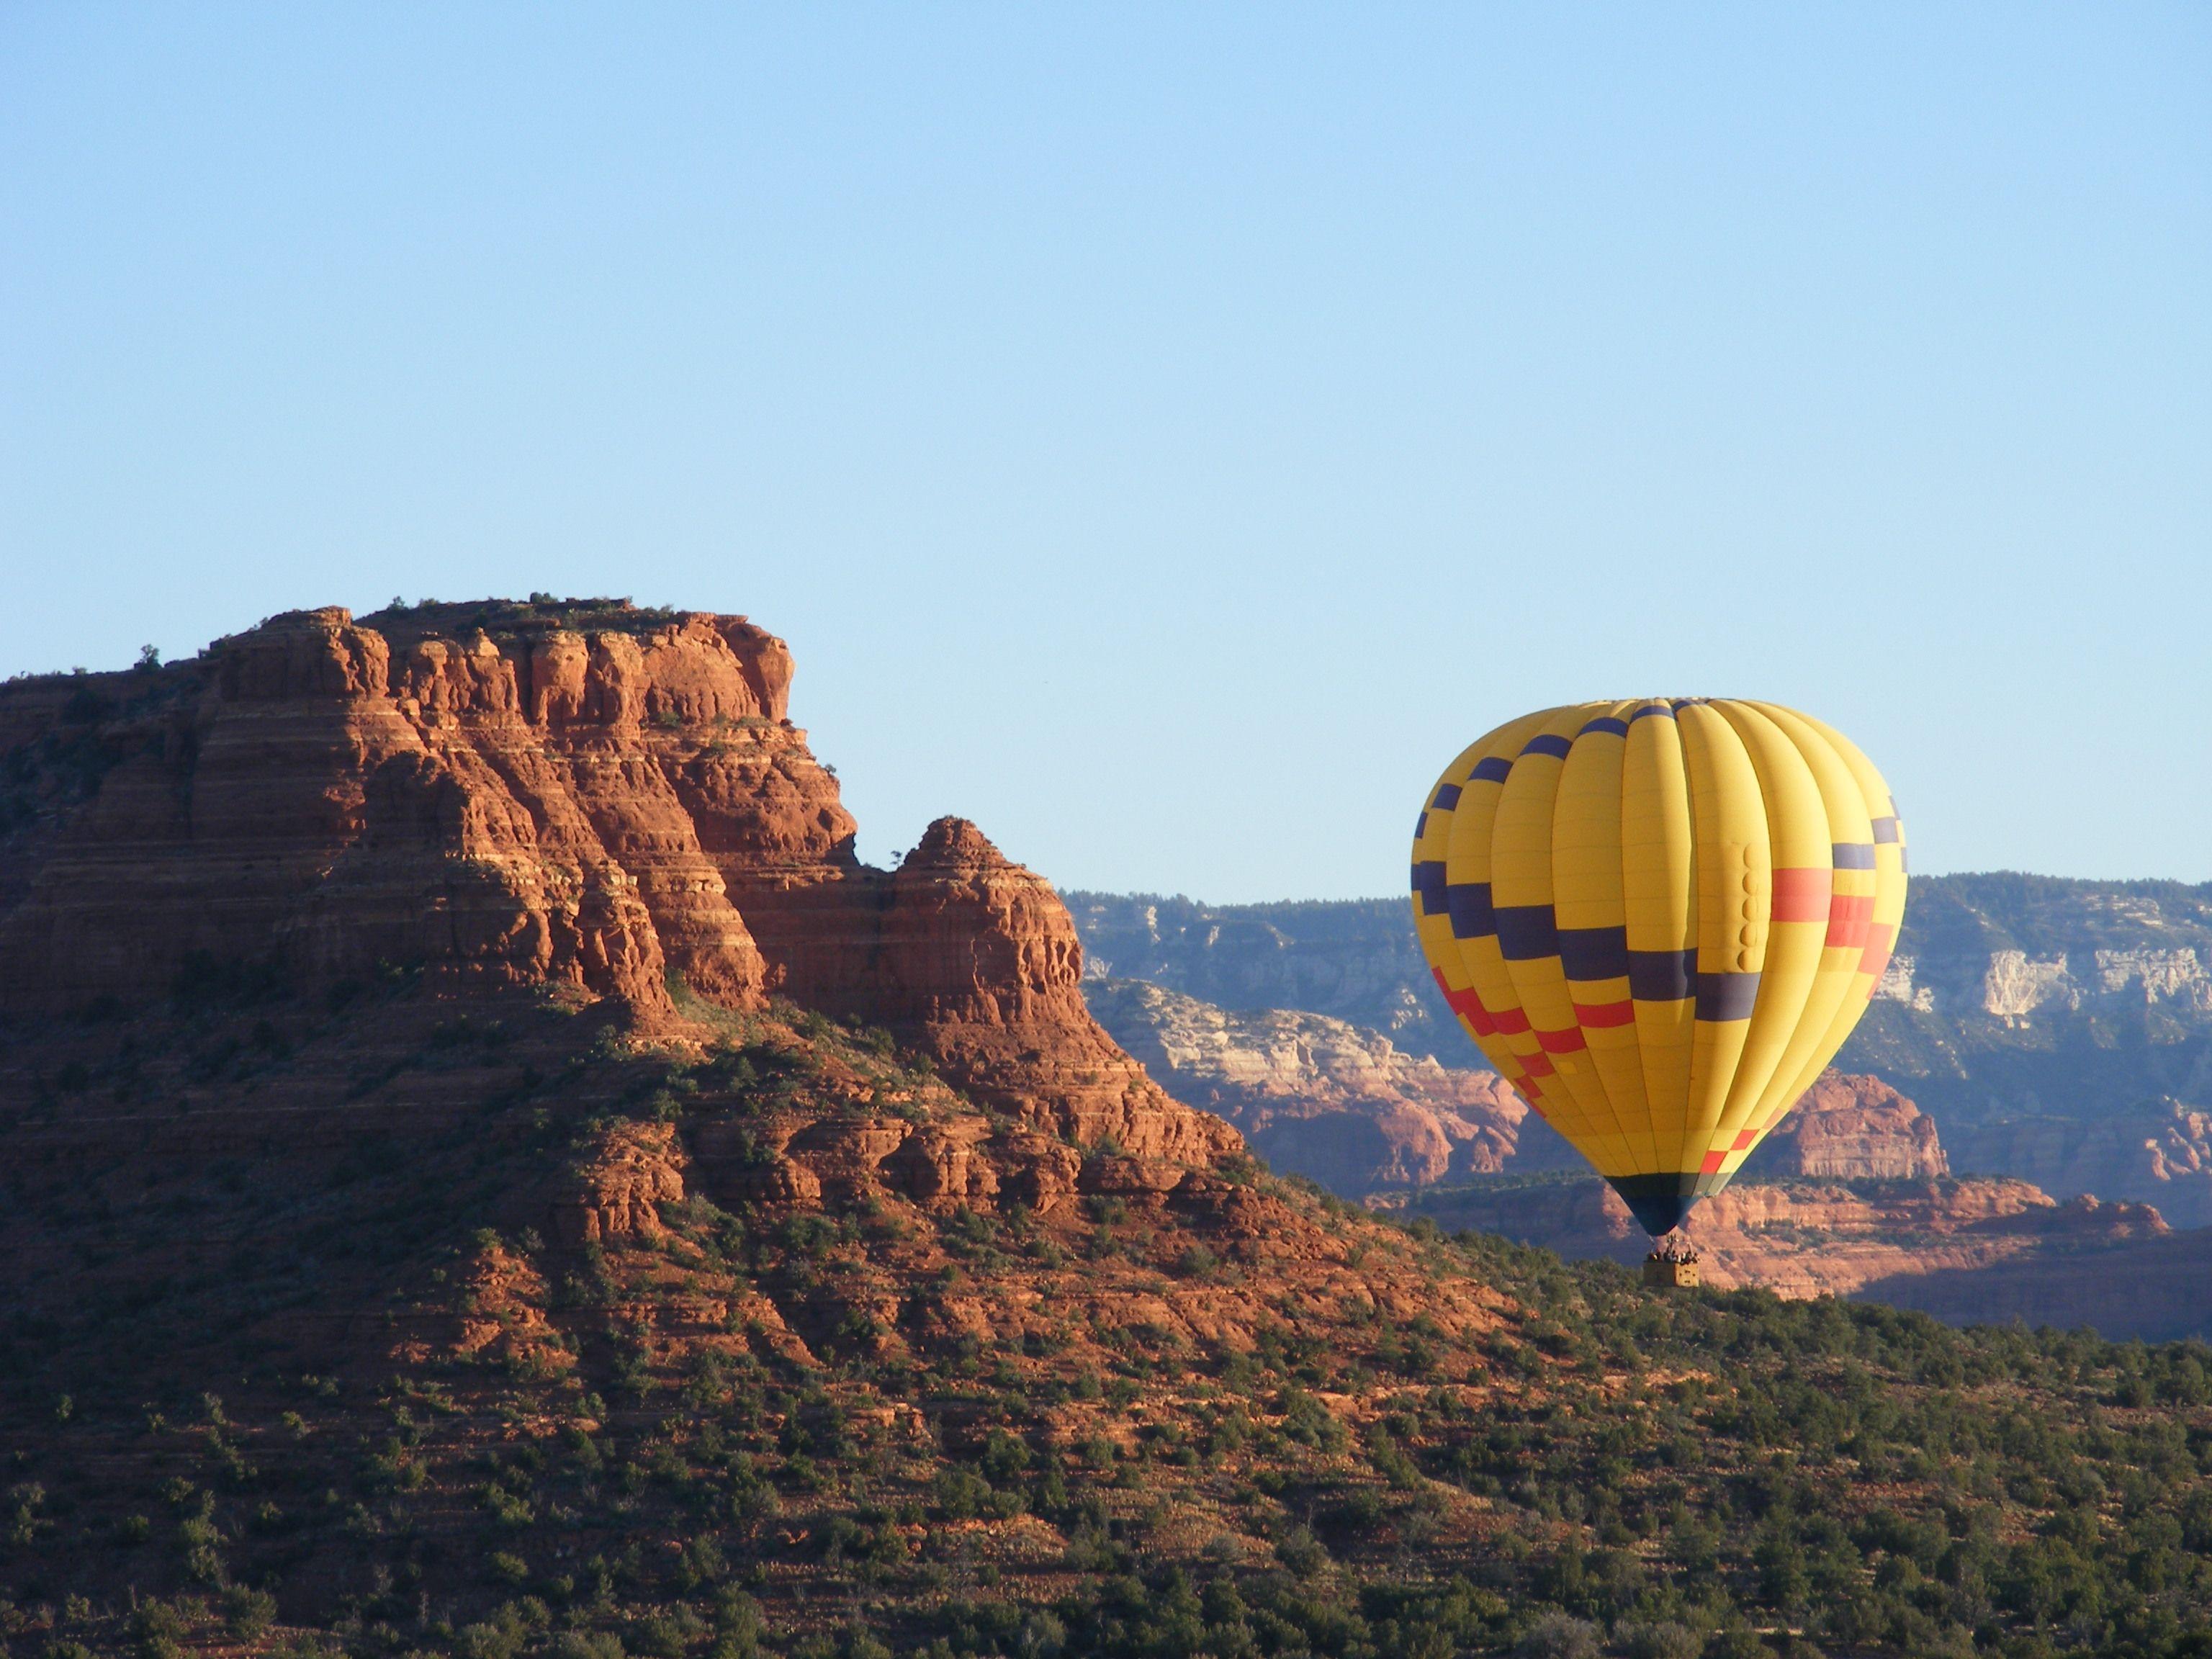 Hot Air Balloon Ride over the Red Rocks Sedona Arizona